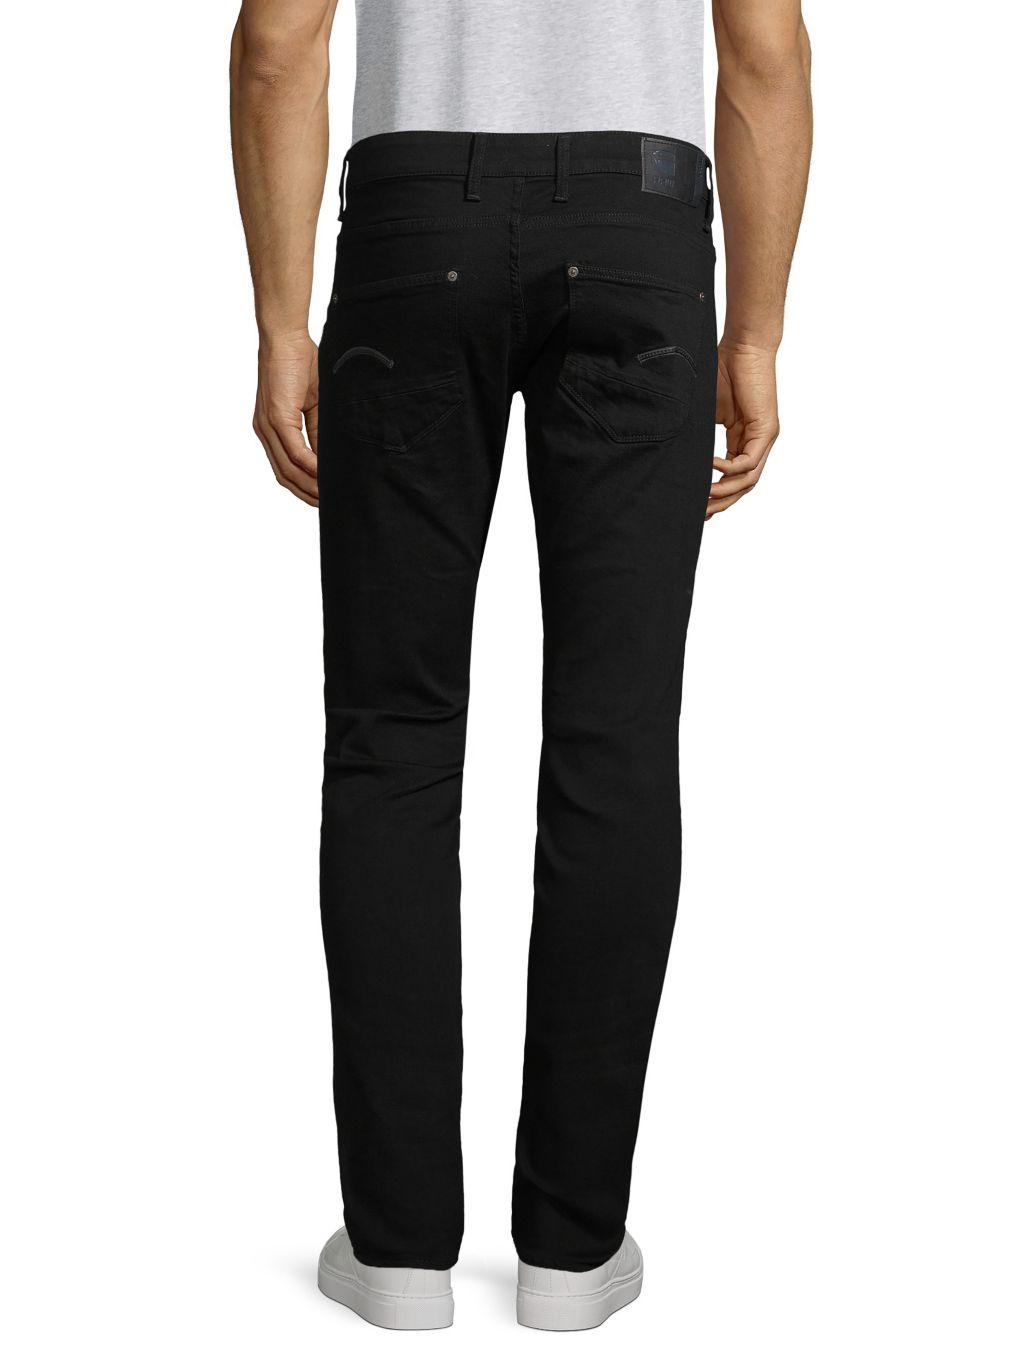 G-Star RAW Skinny-Fit Jeans